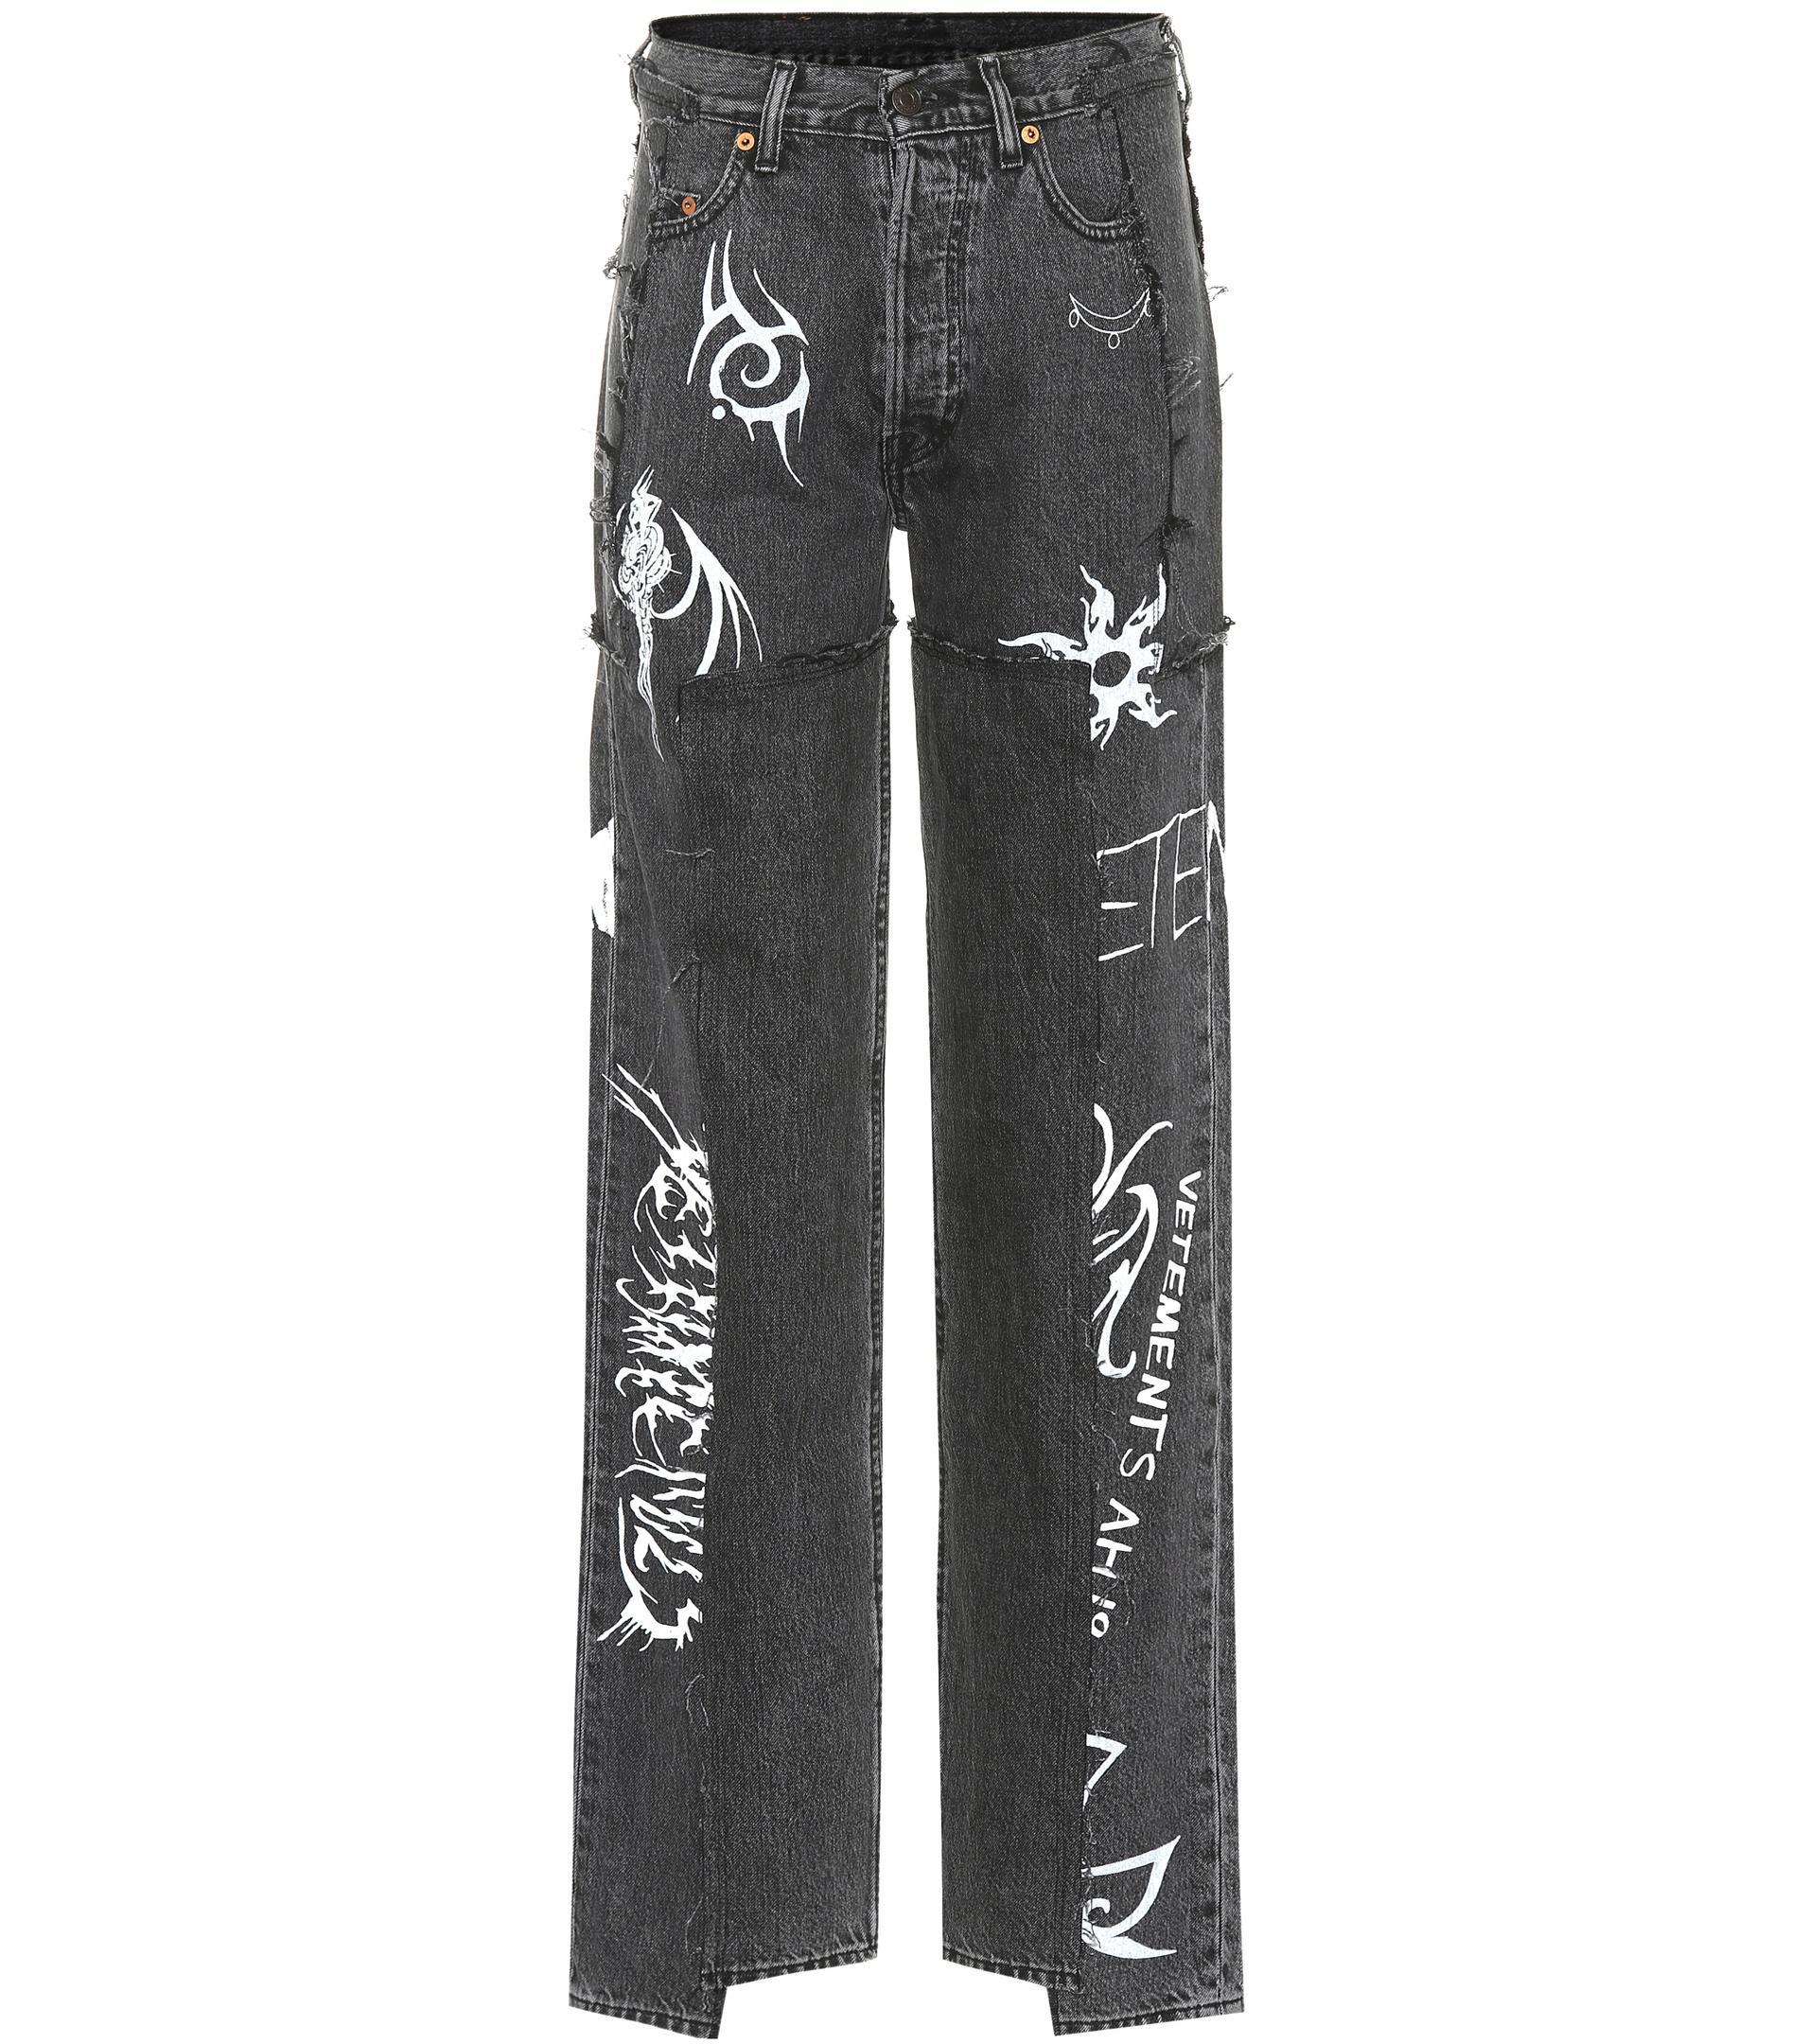 4ffa1373dbfd Vetements X Levi s® – High-rise Wide-leg Jeans in Black - Lyst